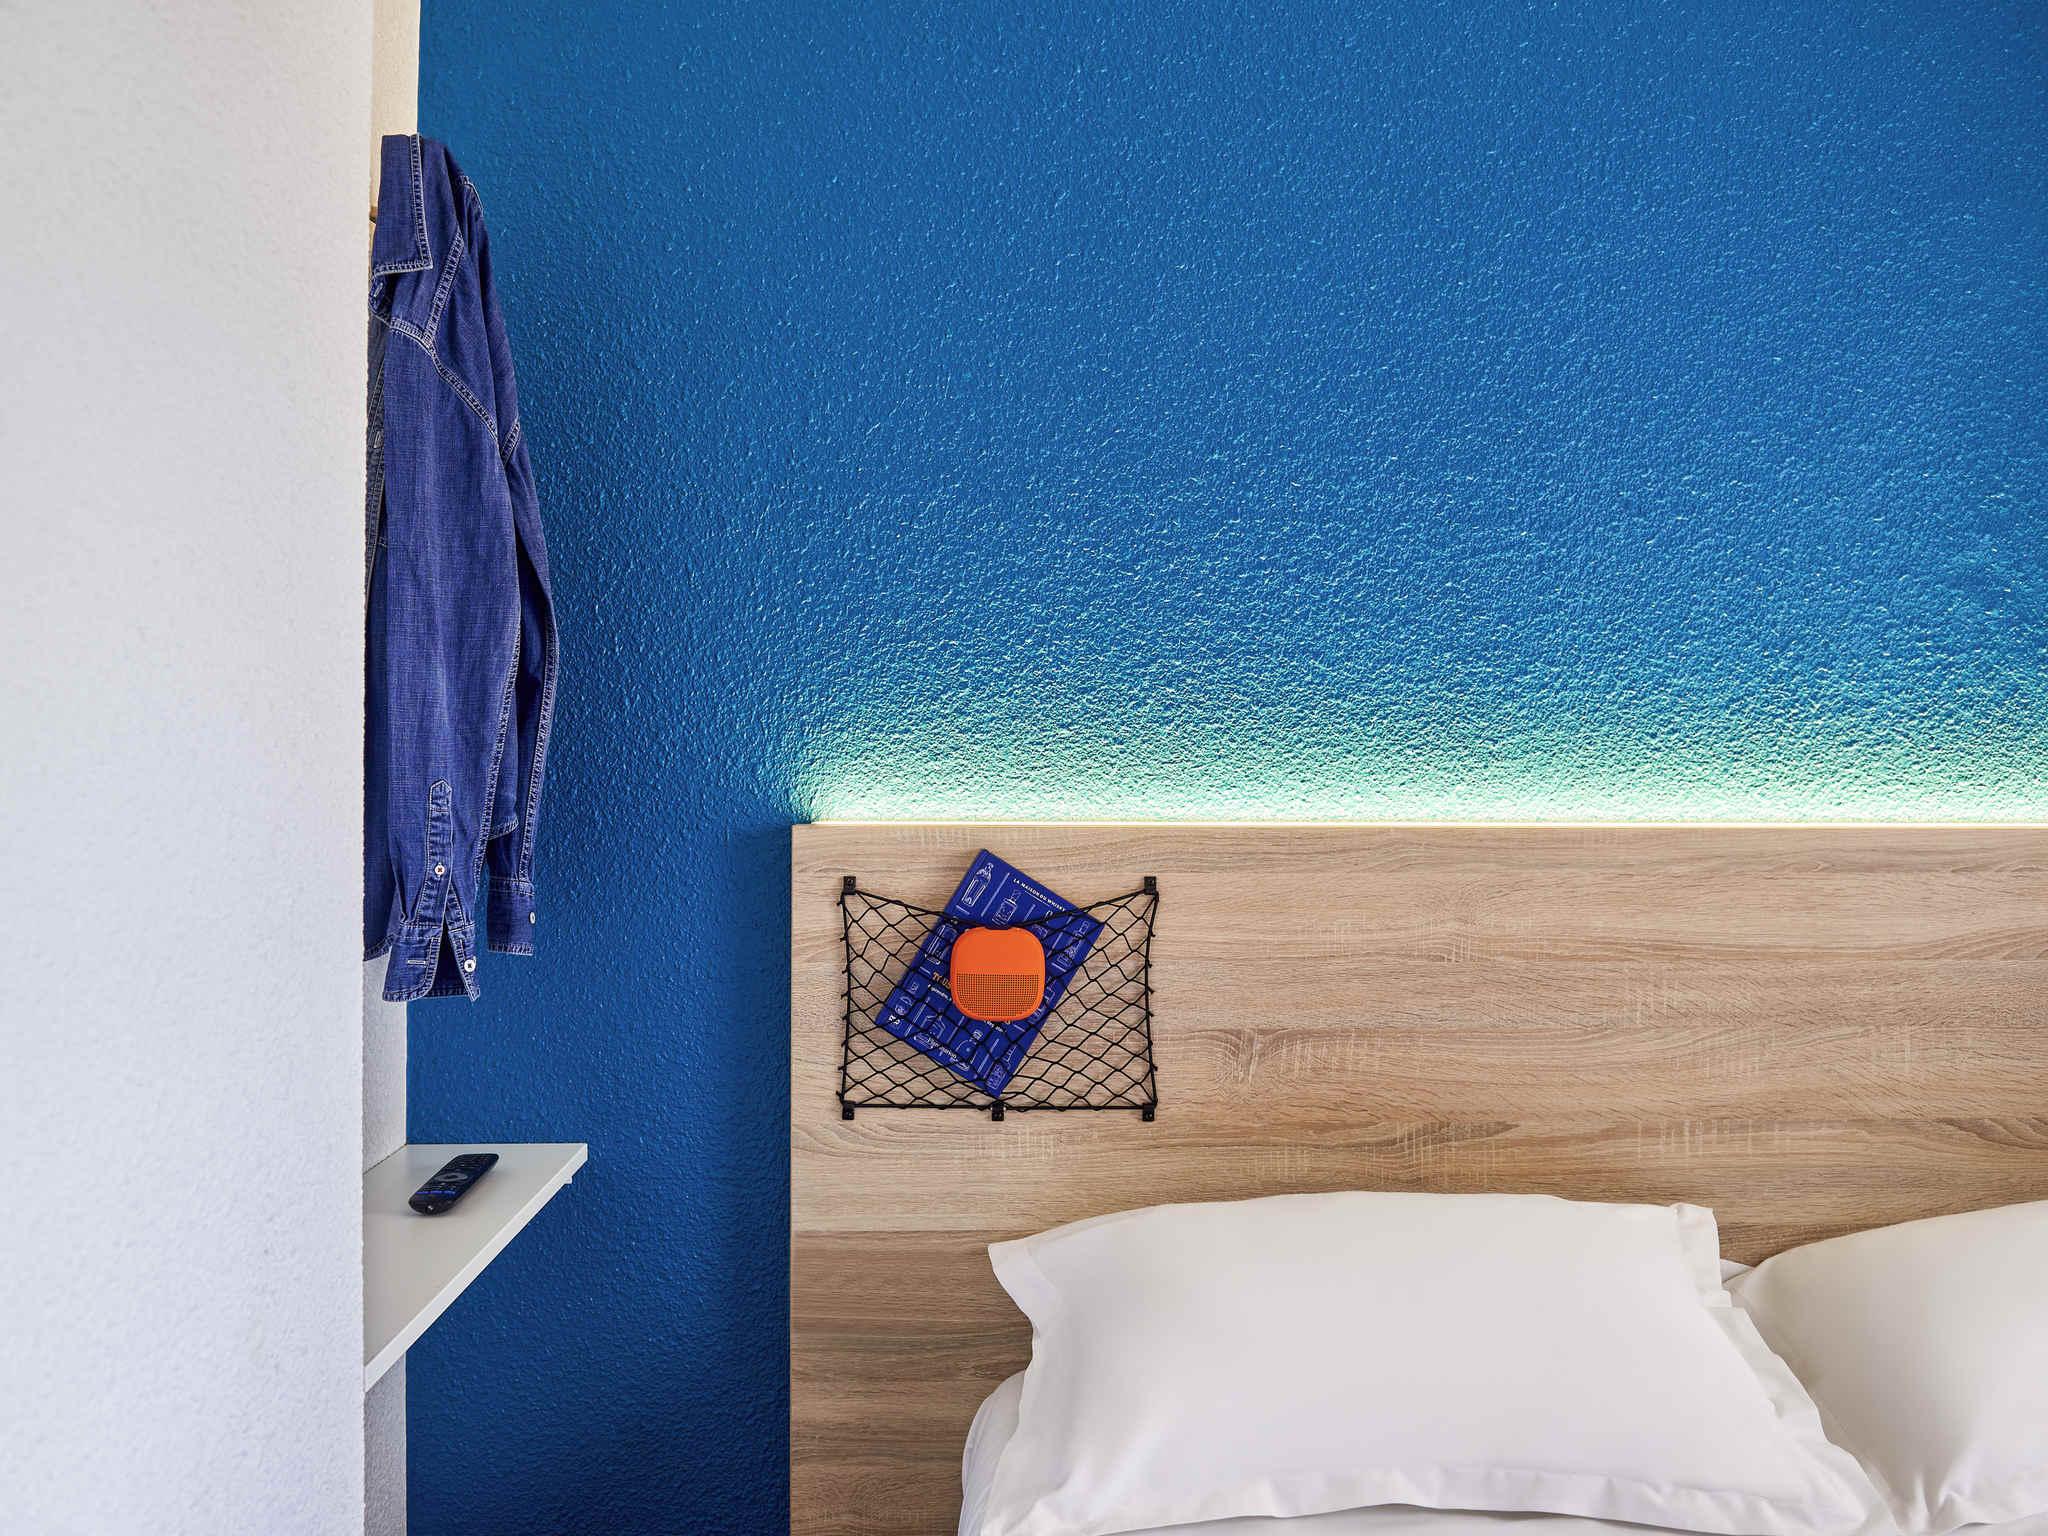 Отель — hotelF1 Chaumont